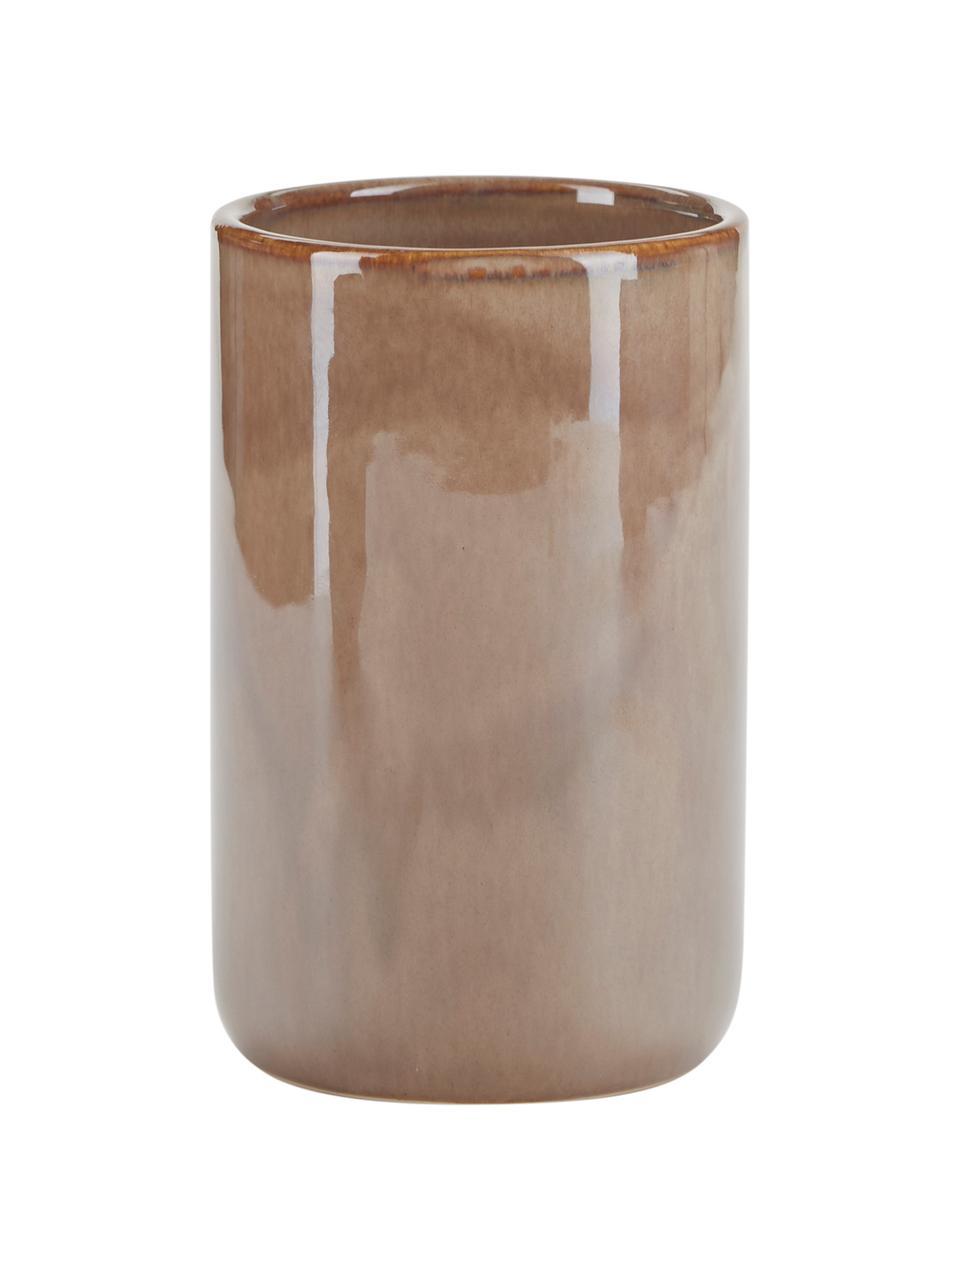 Portaspazzolino in ceramica marrone Tin, Ceramica, Marrone, Ø 8 x Alt. 12 cm